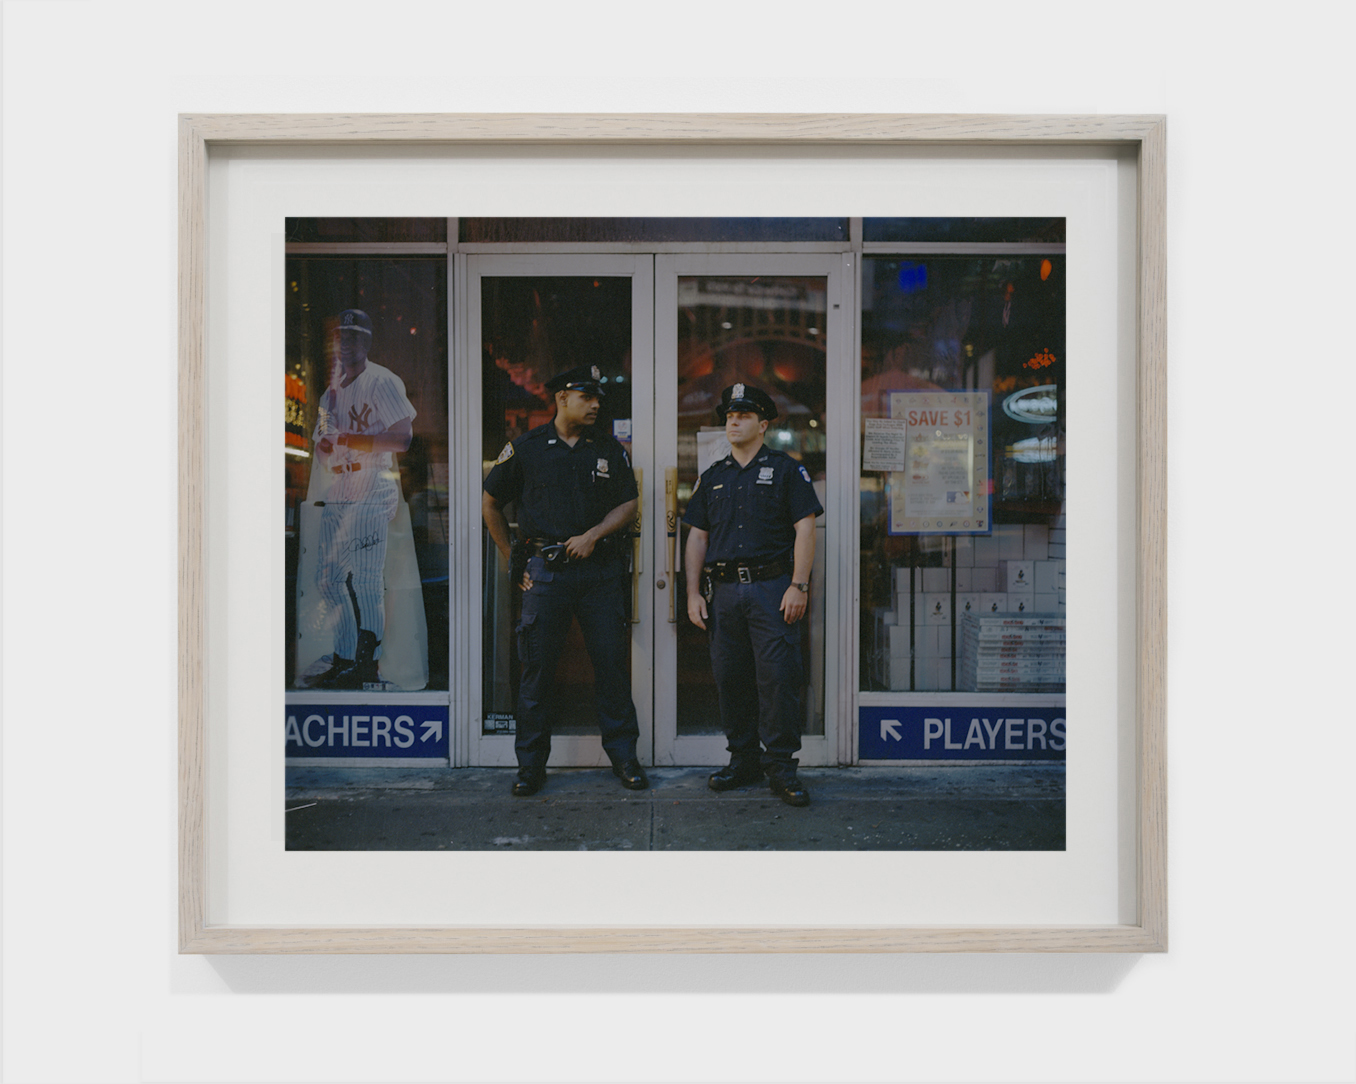 newyork_website_frame_21.jpg